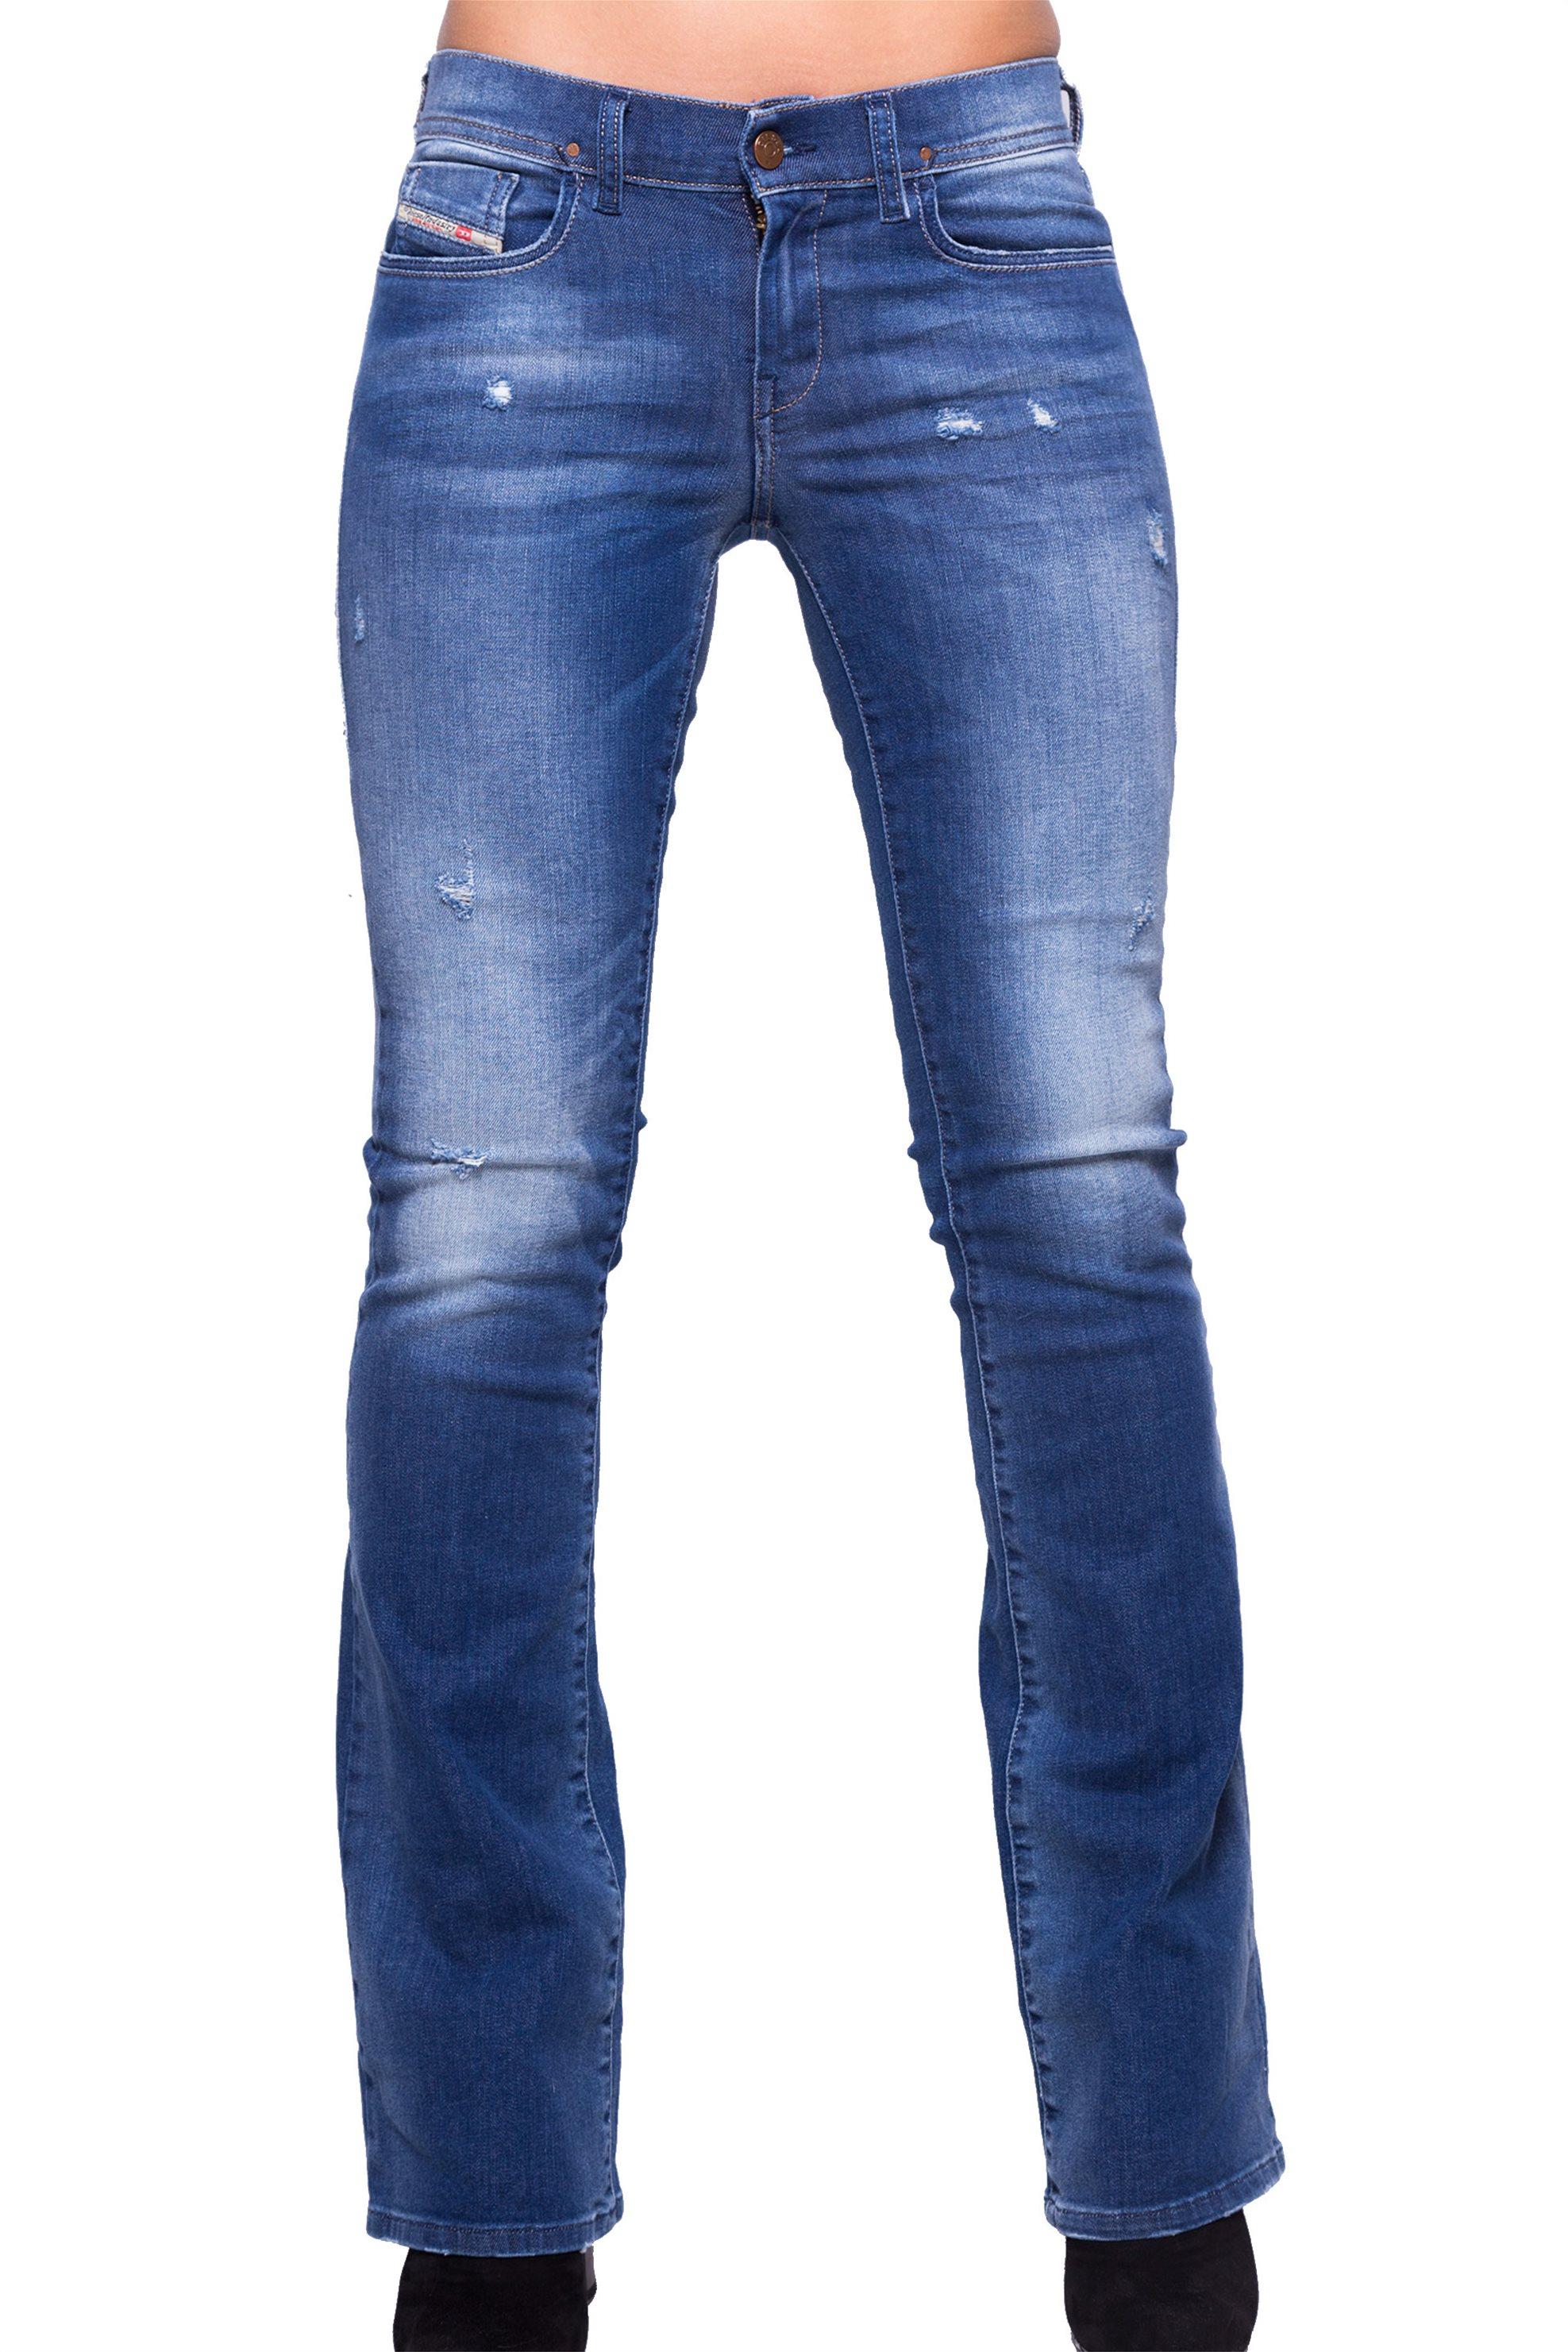 55a11639722 Γυναικεία Παντελόνια | DIESEL (Ταξινόμηση: Ακριβότερα) | Σελίδα 3 ...